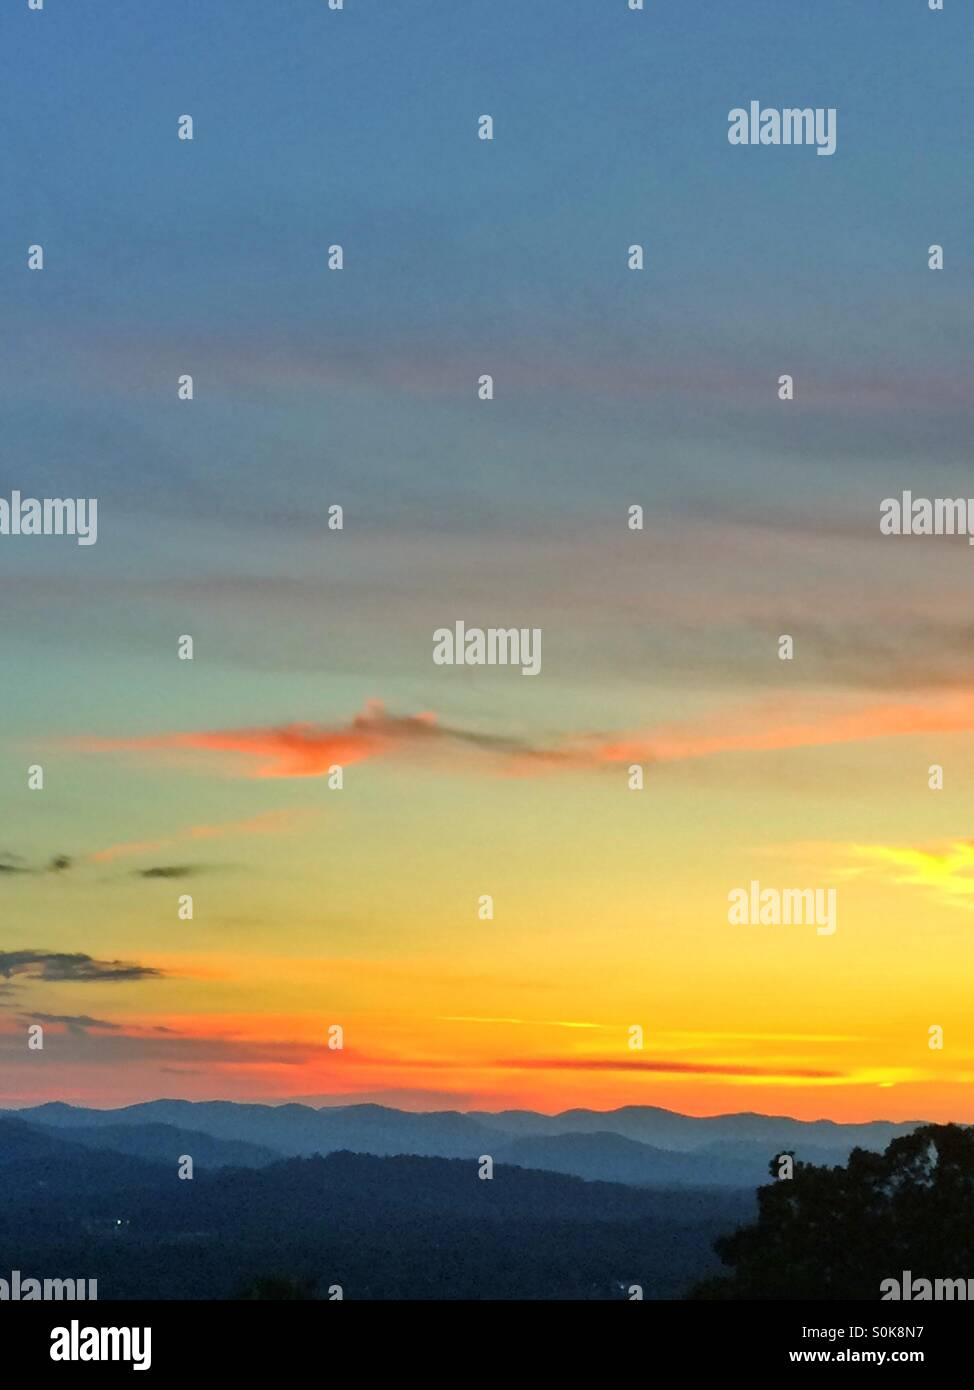 Sunset over the Blue Ridge Mountains at Asheville, North Carolina. - Stock Image